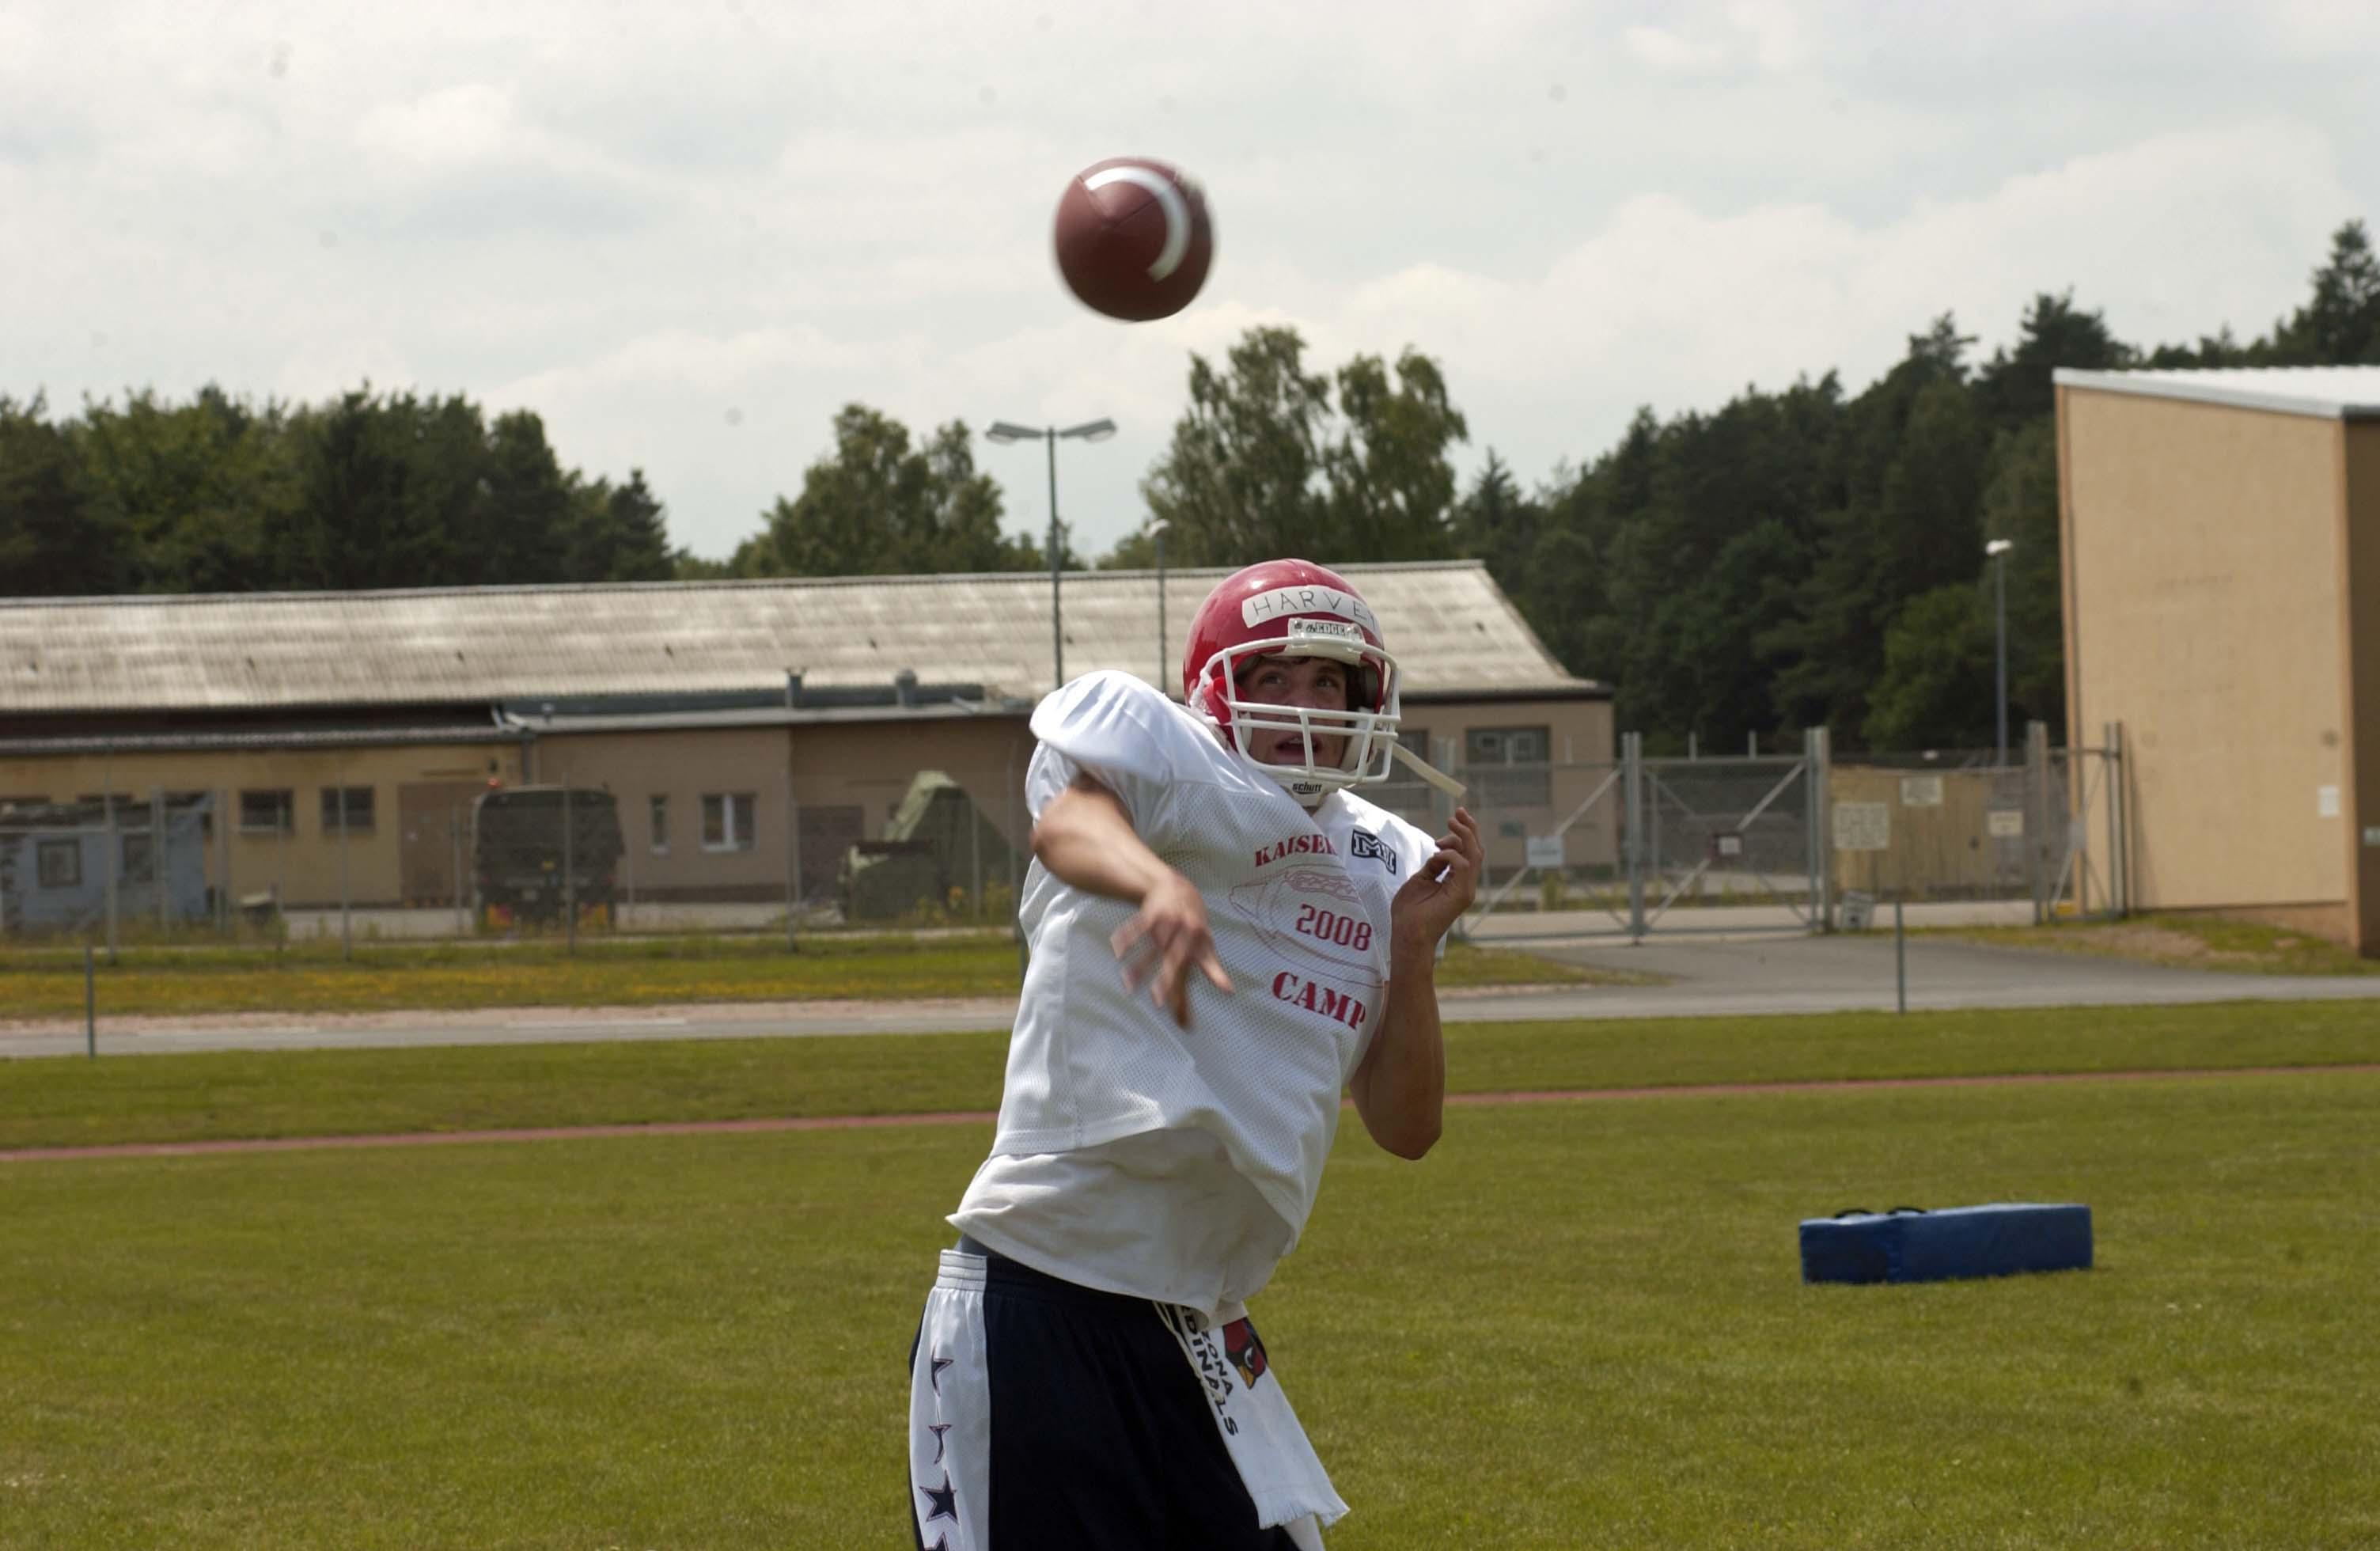 2008 Football Camp Kaiserslautern Quarterback Throws The